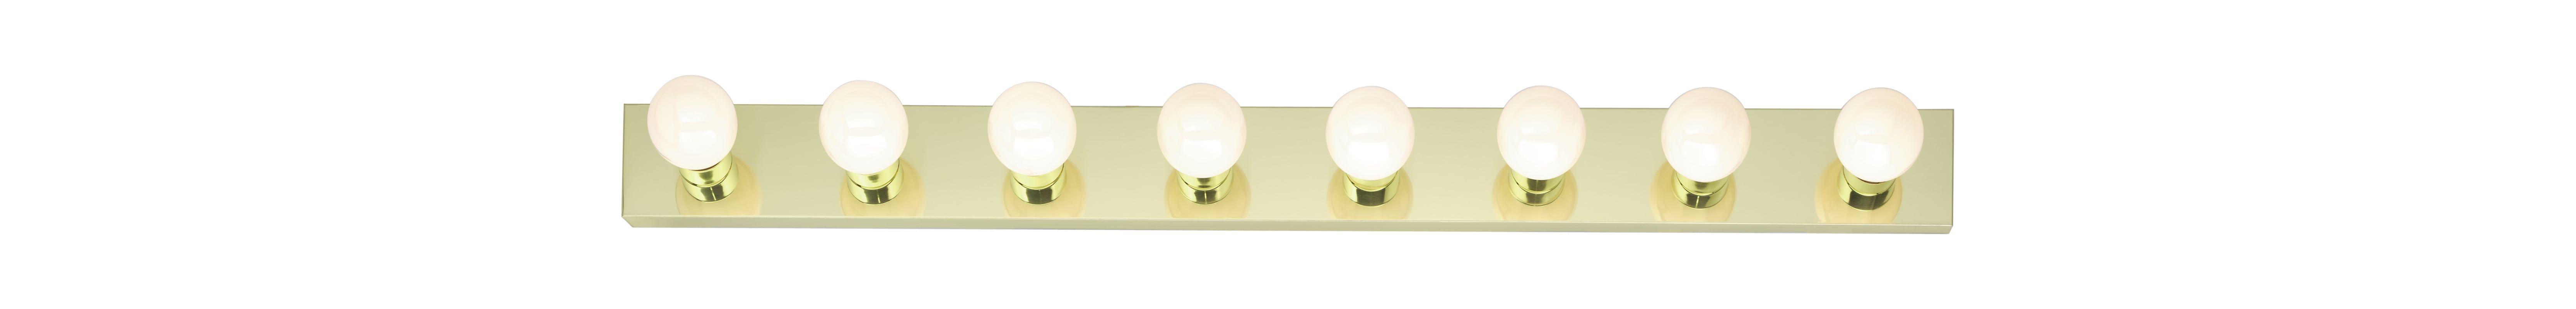 Nuvo Lighting Eight Light Bathroom Bar Light Polished - 8 light bathroom bar